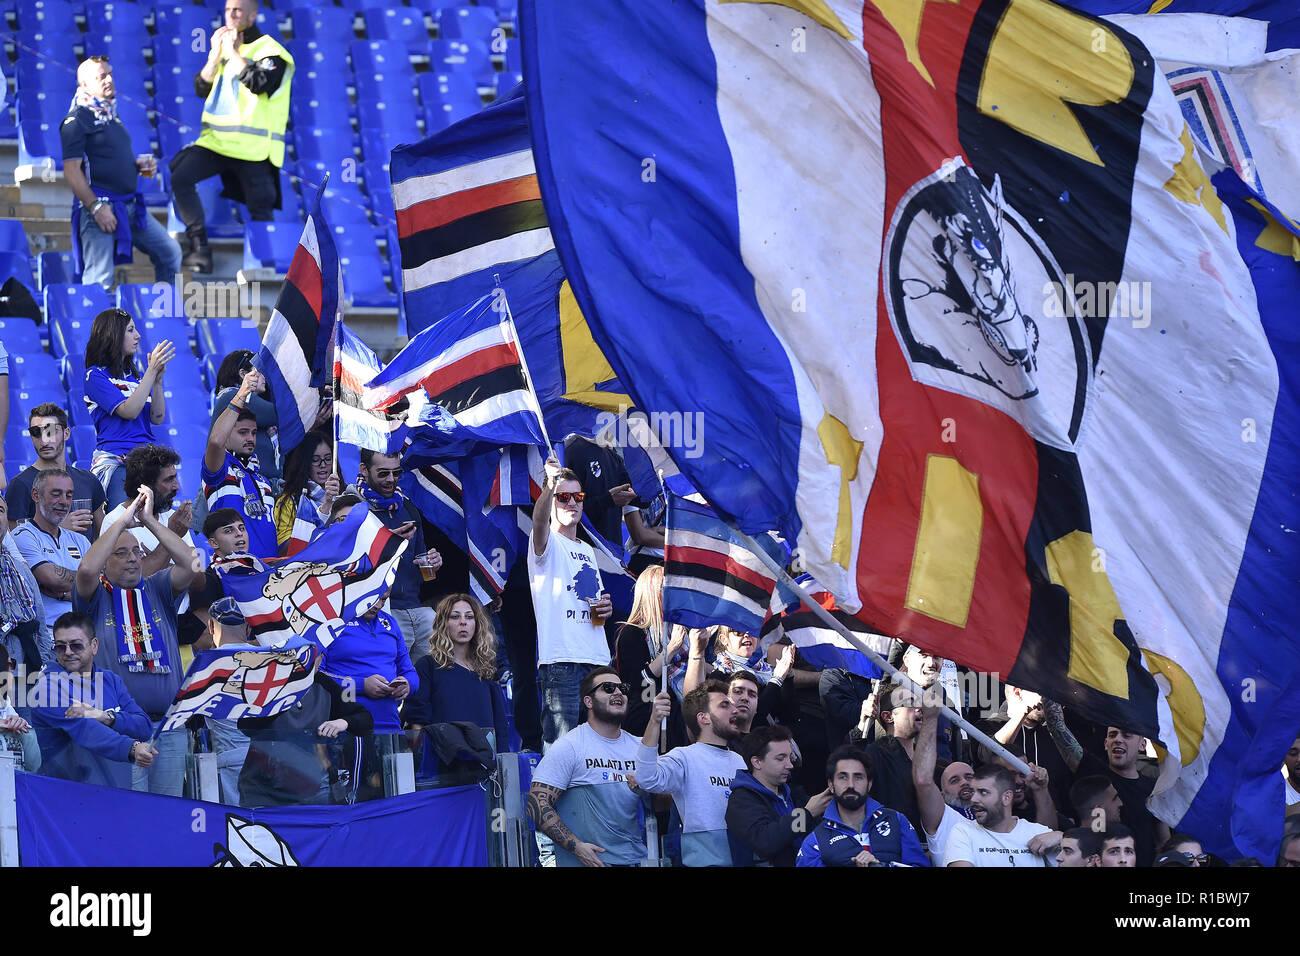 Rome, Italy. 11th Nov 2018. Sampdoria supporters during the Serie A match between Roma and Sampdoria at Stadio Olimpico, Rome, Italy on 11 November 2018. Credit: Giuseppe Maffia/Alamy Live News Stock Photo